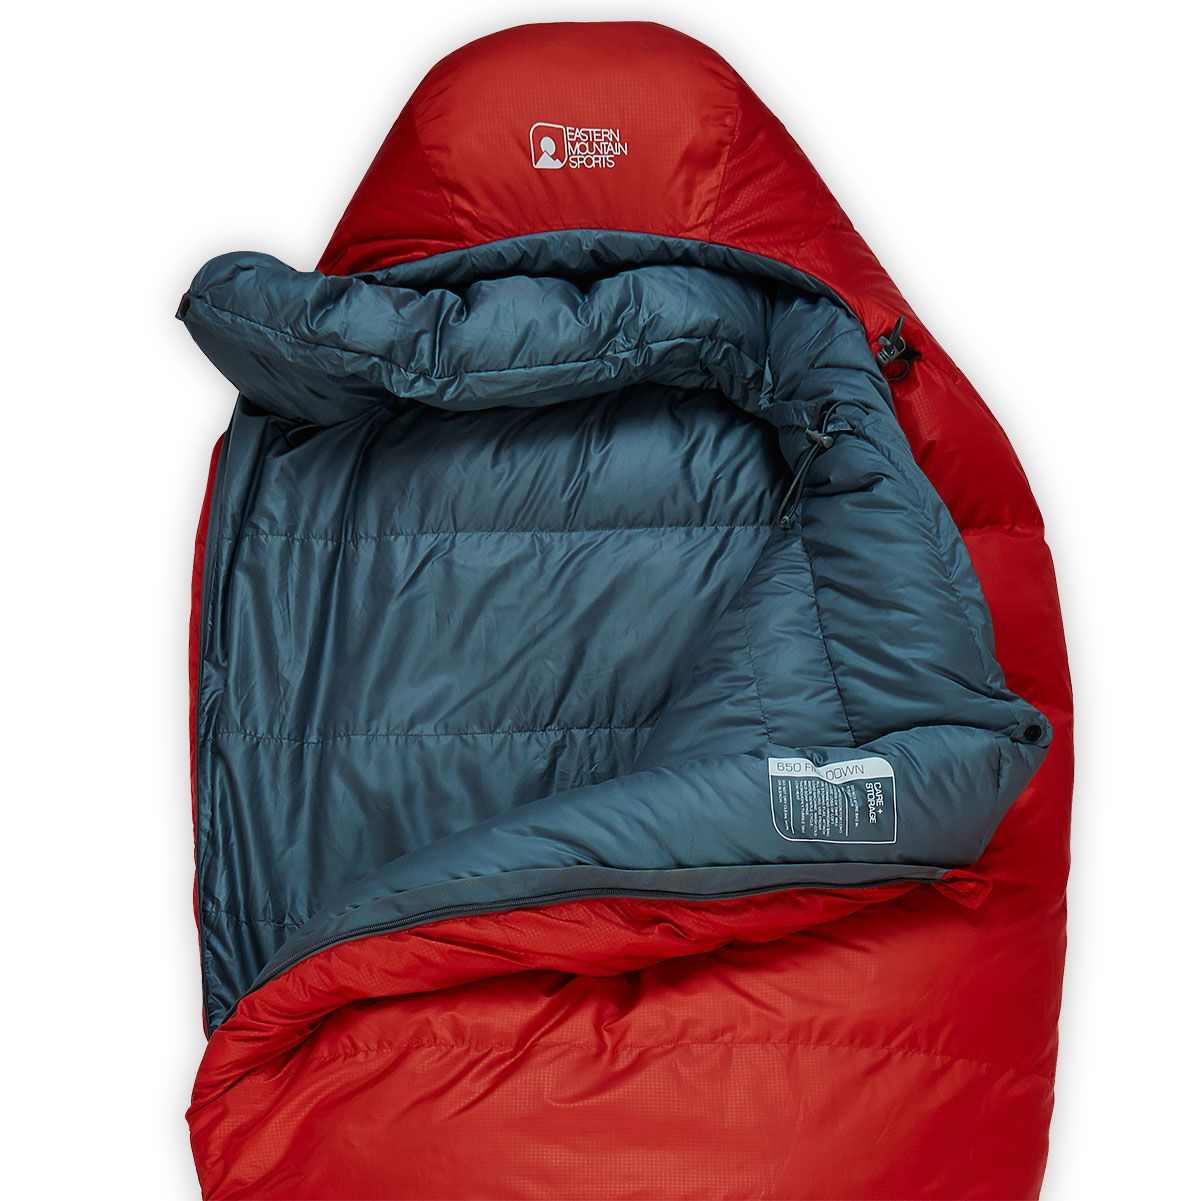 Ems Simmer Down 0 Sleeping Bag